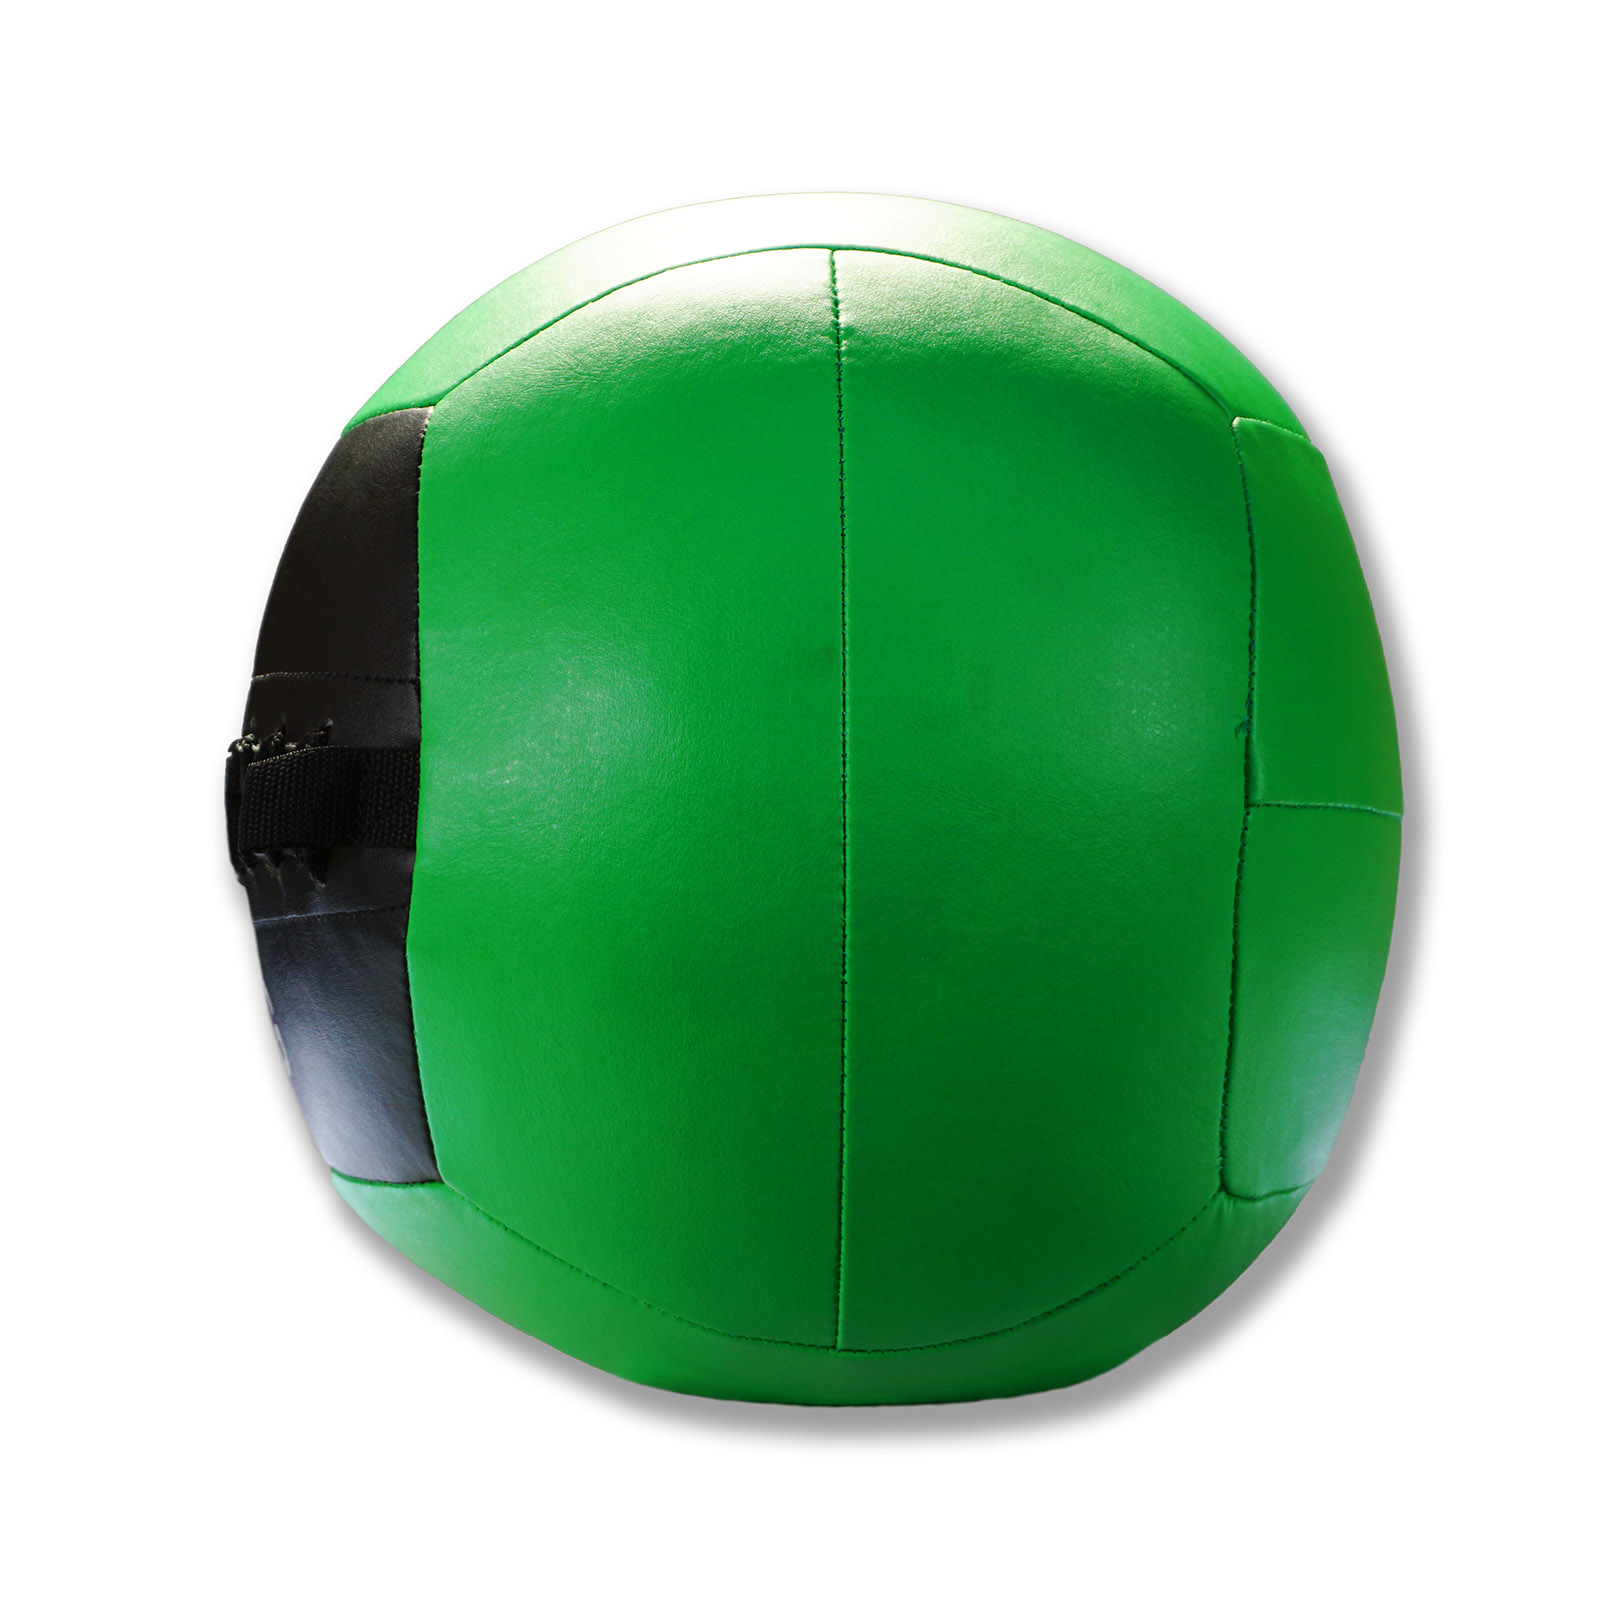 6 kgs wall ball